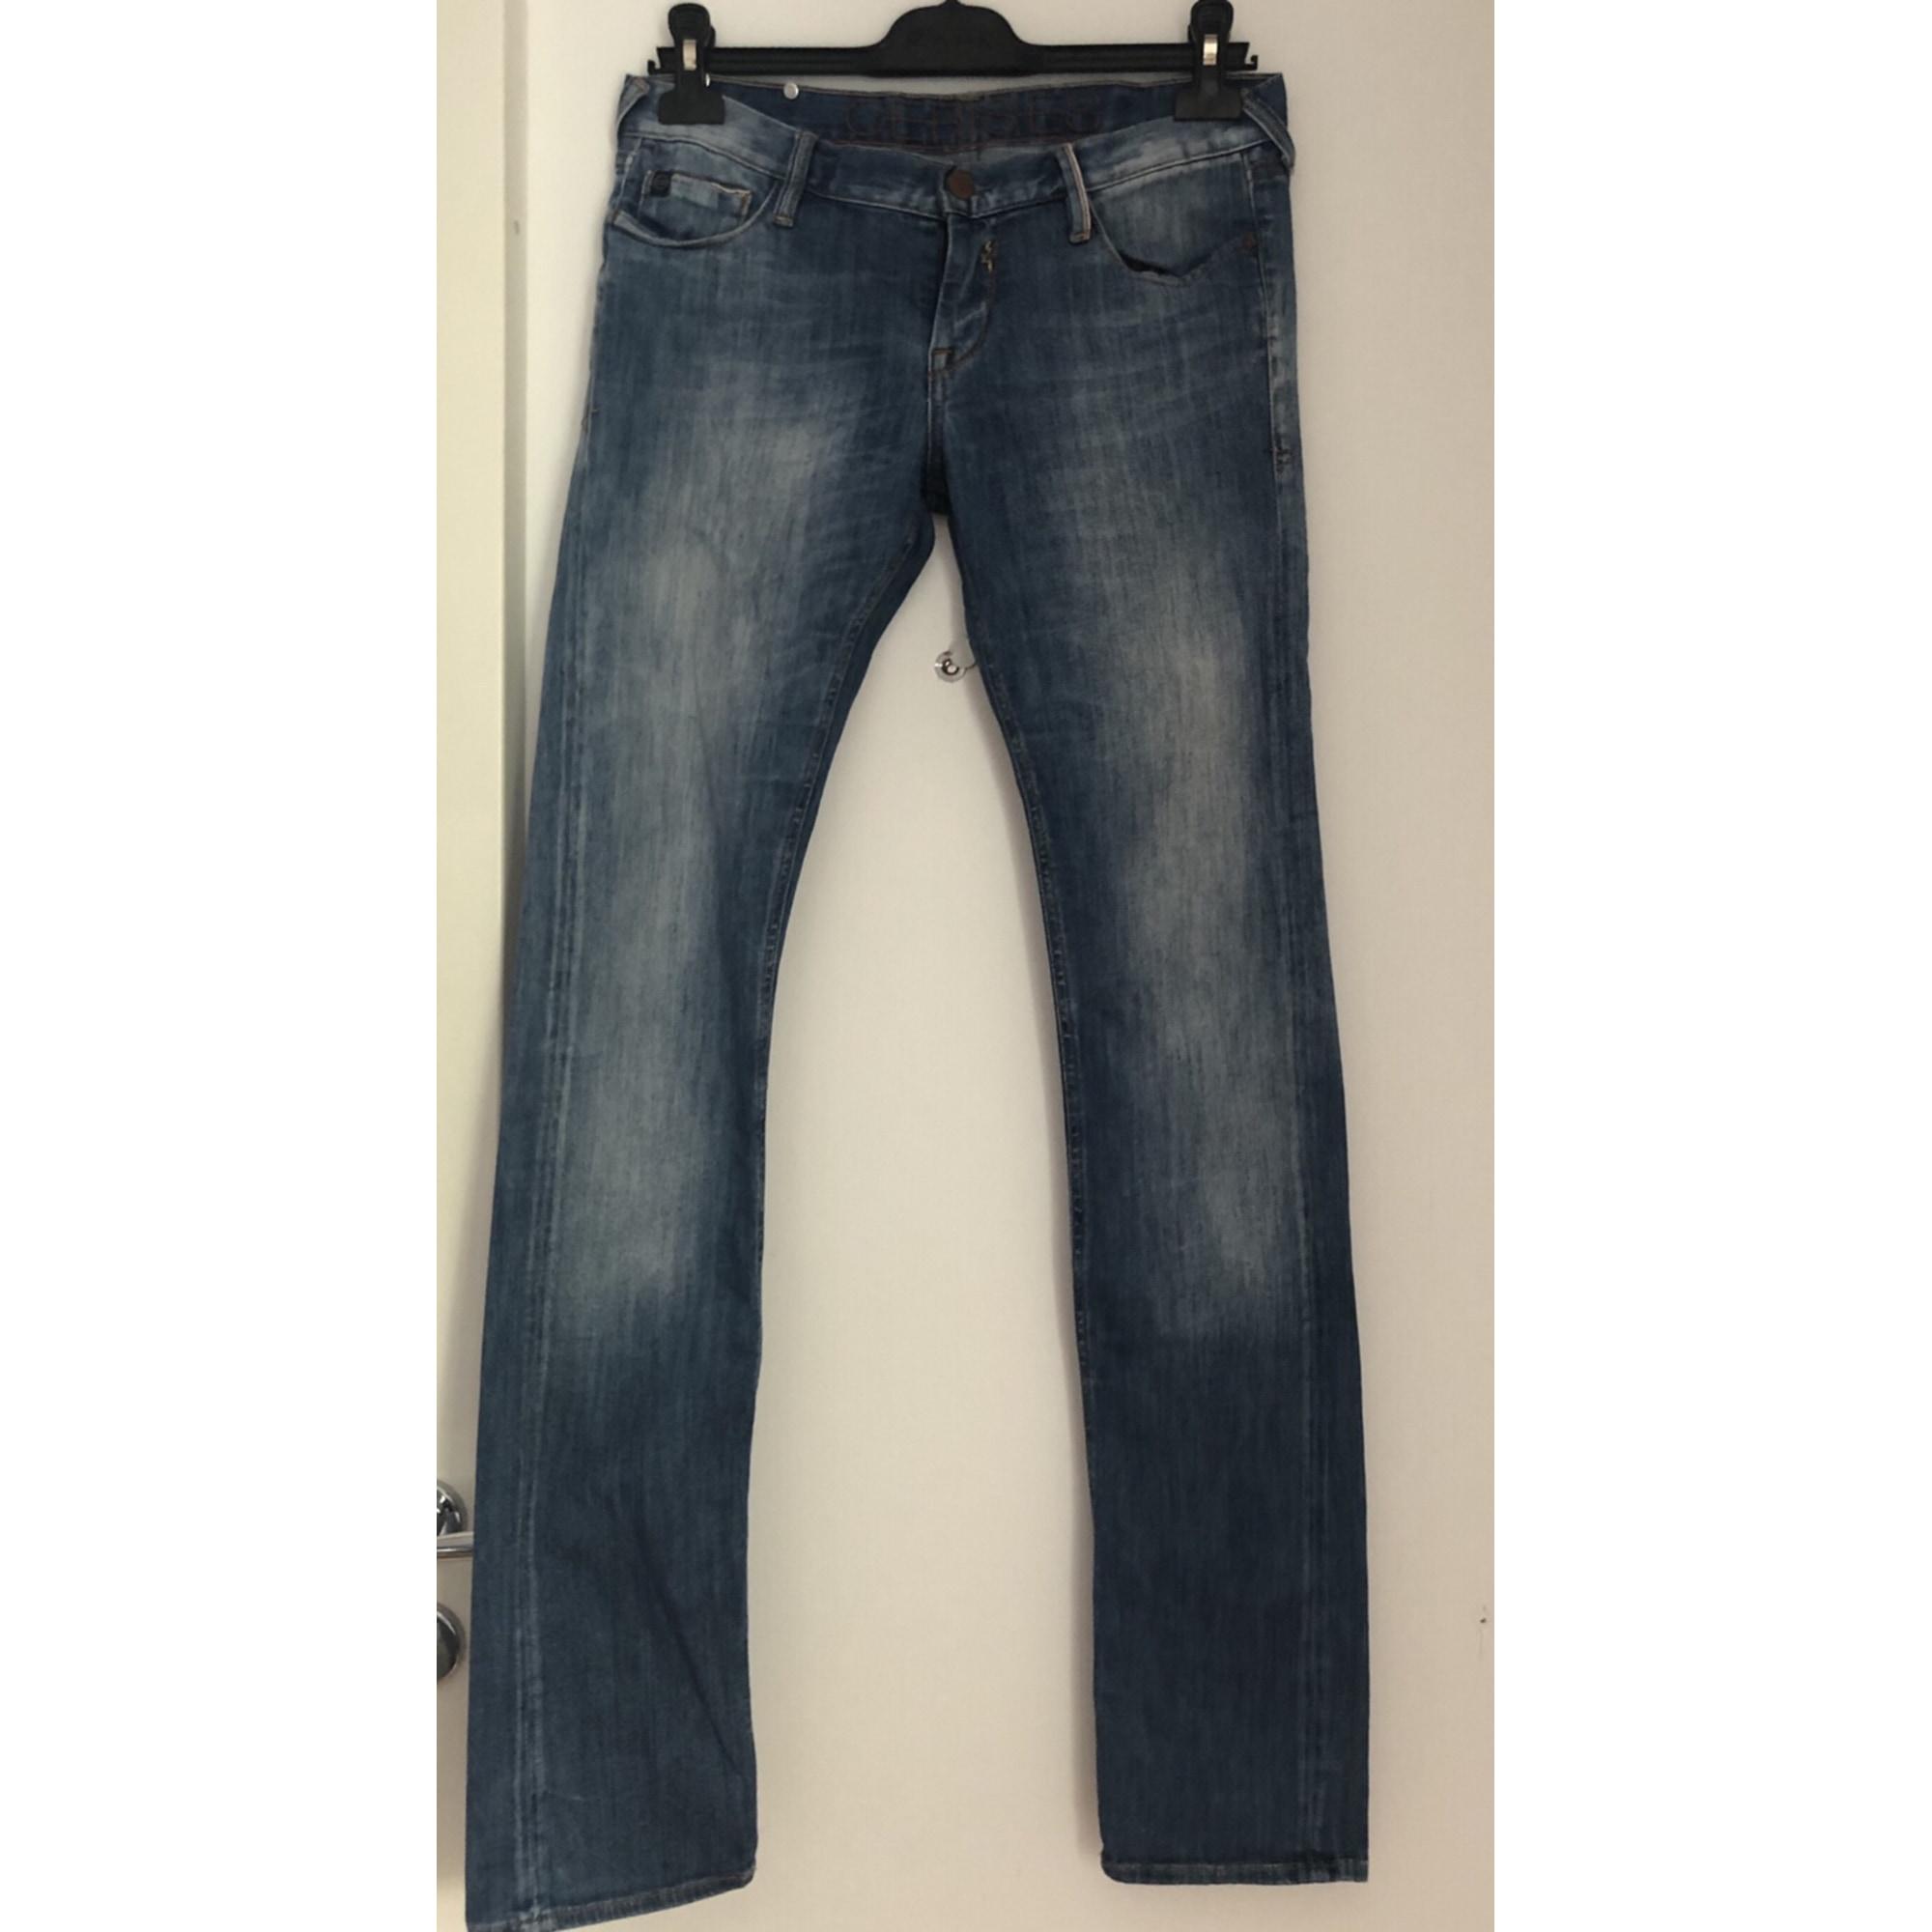 Pantalon droit LE TEMPS DES CERISES Bleu, bleu marine, bleu turquoise